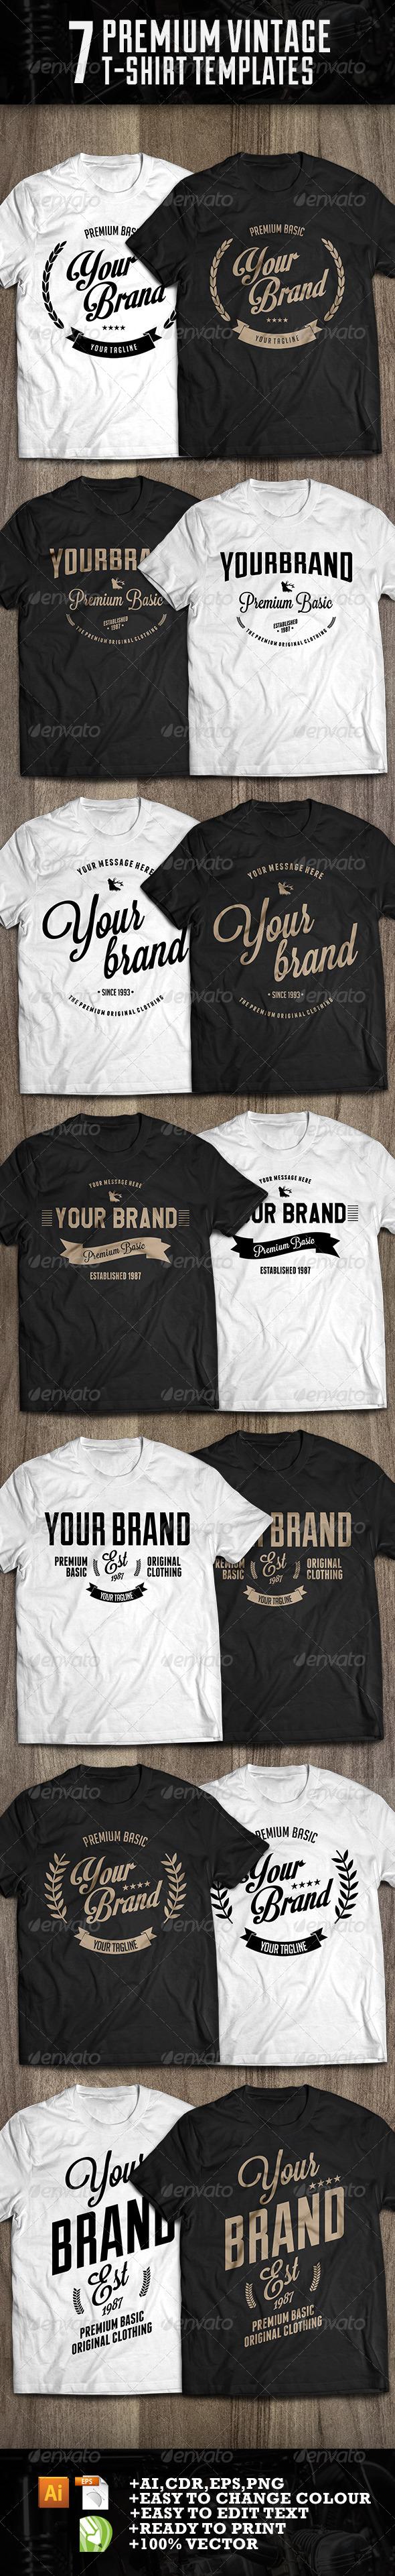 7 premium t-shirt template